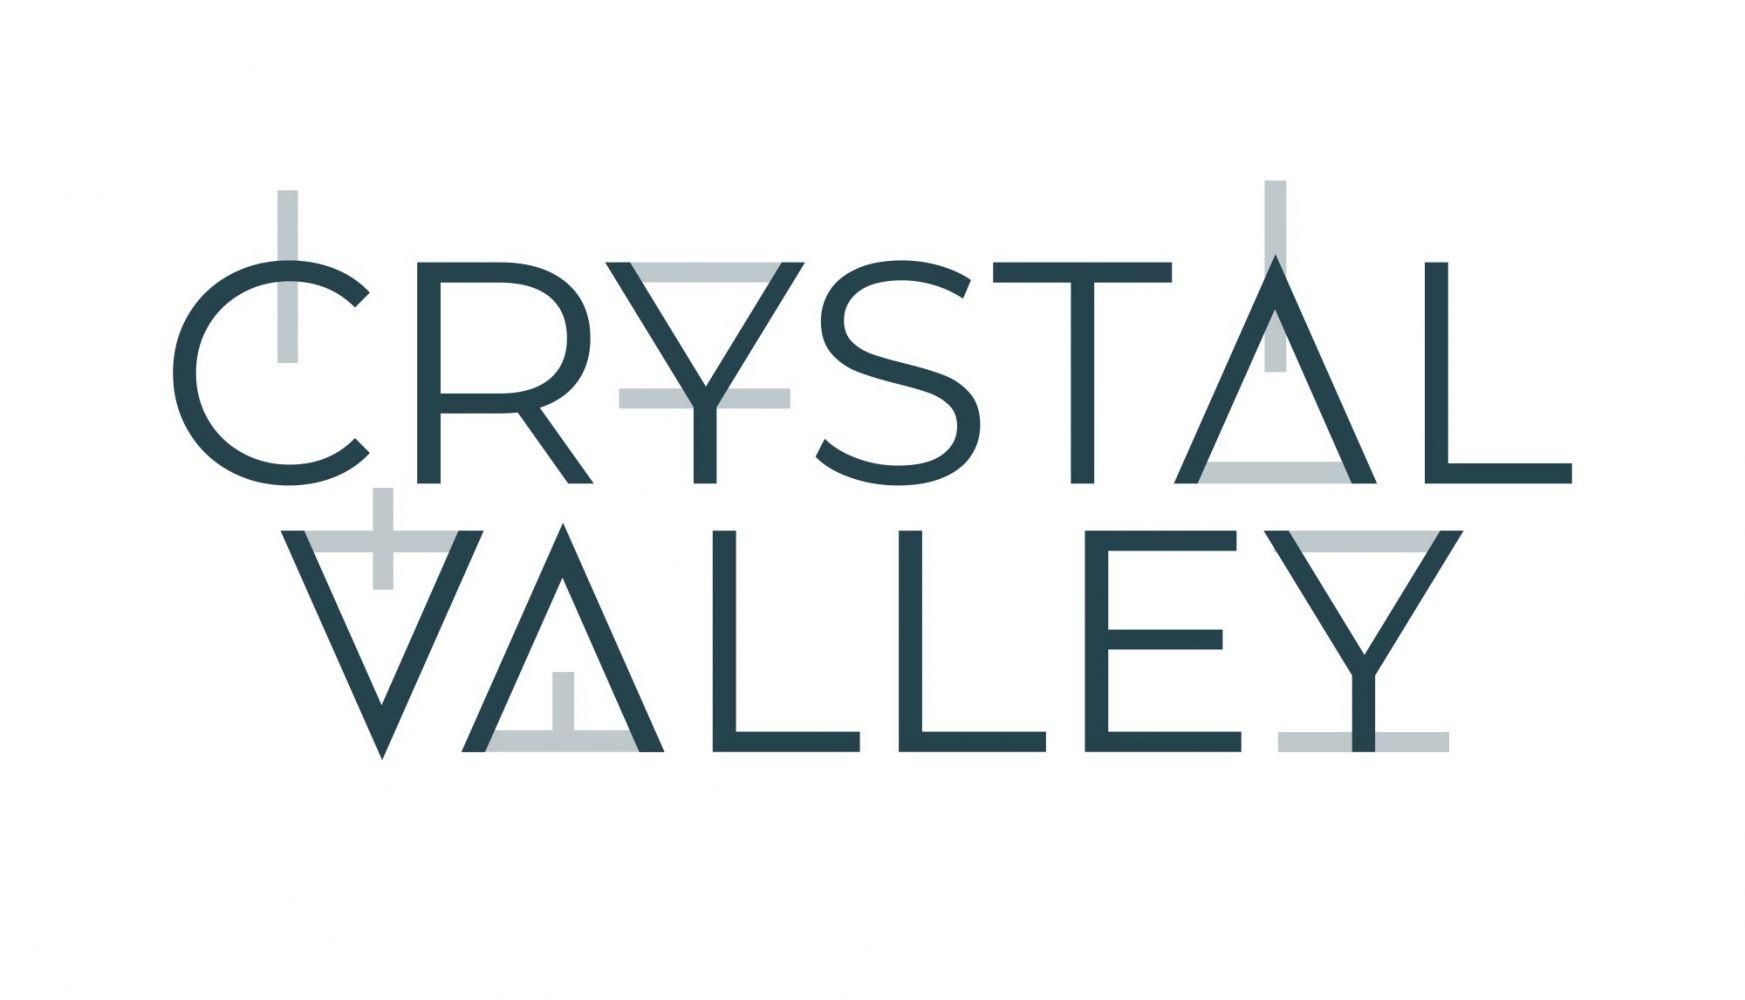 Křišťálové údolí